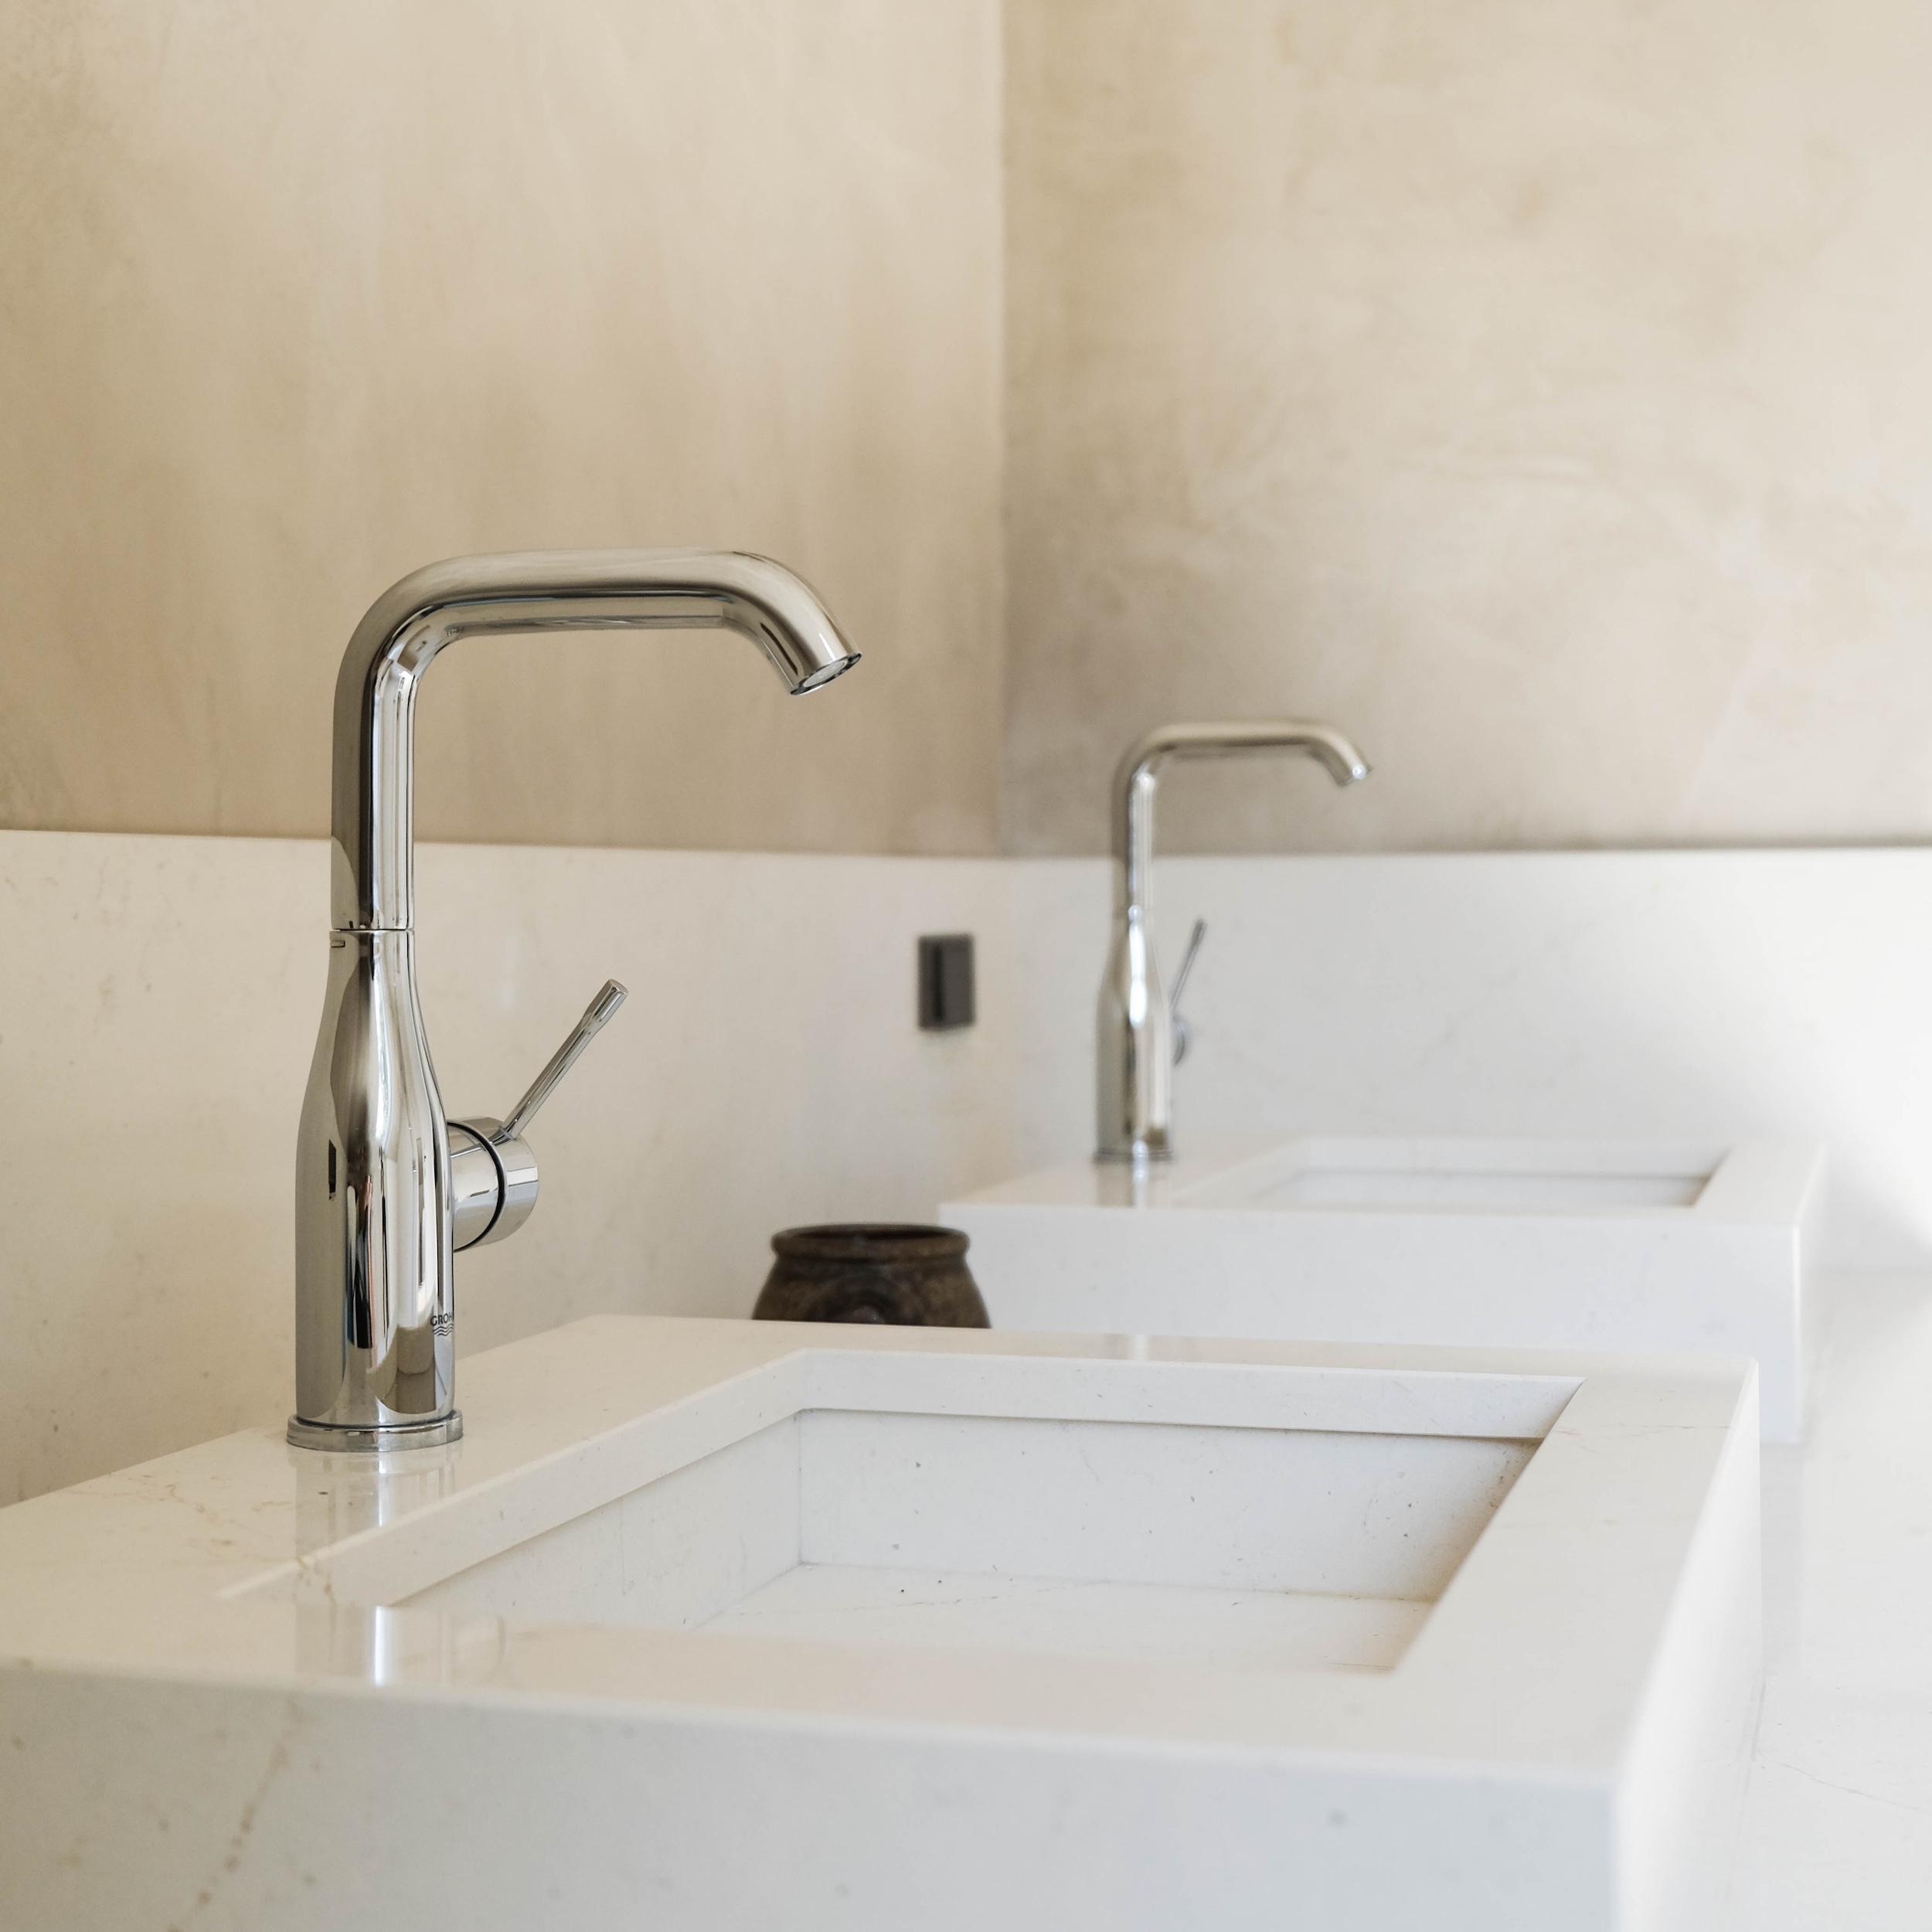 salle de bain robinetterie maison